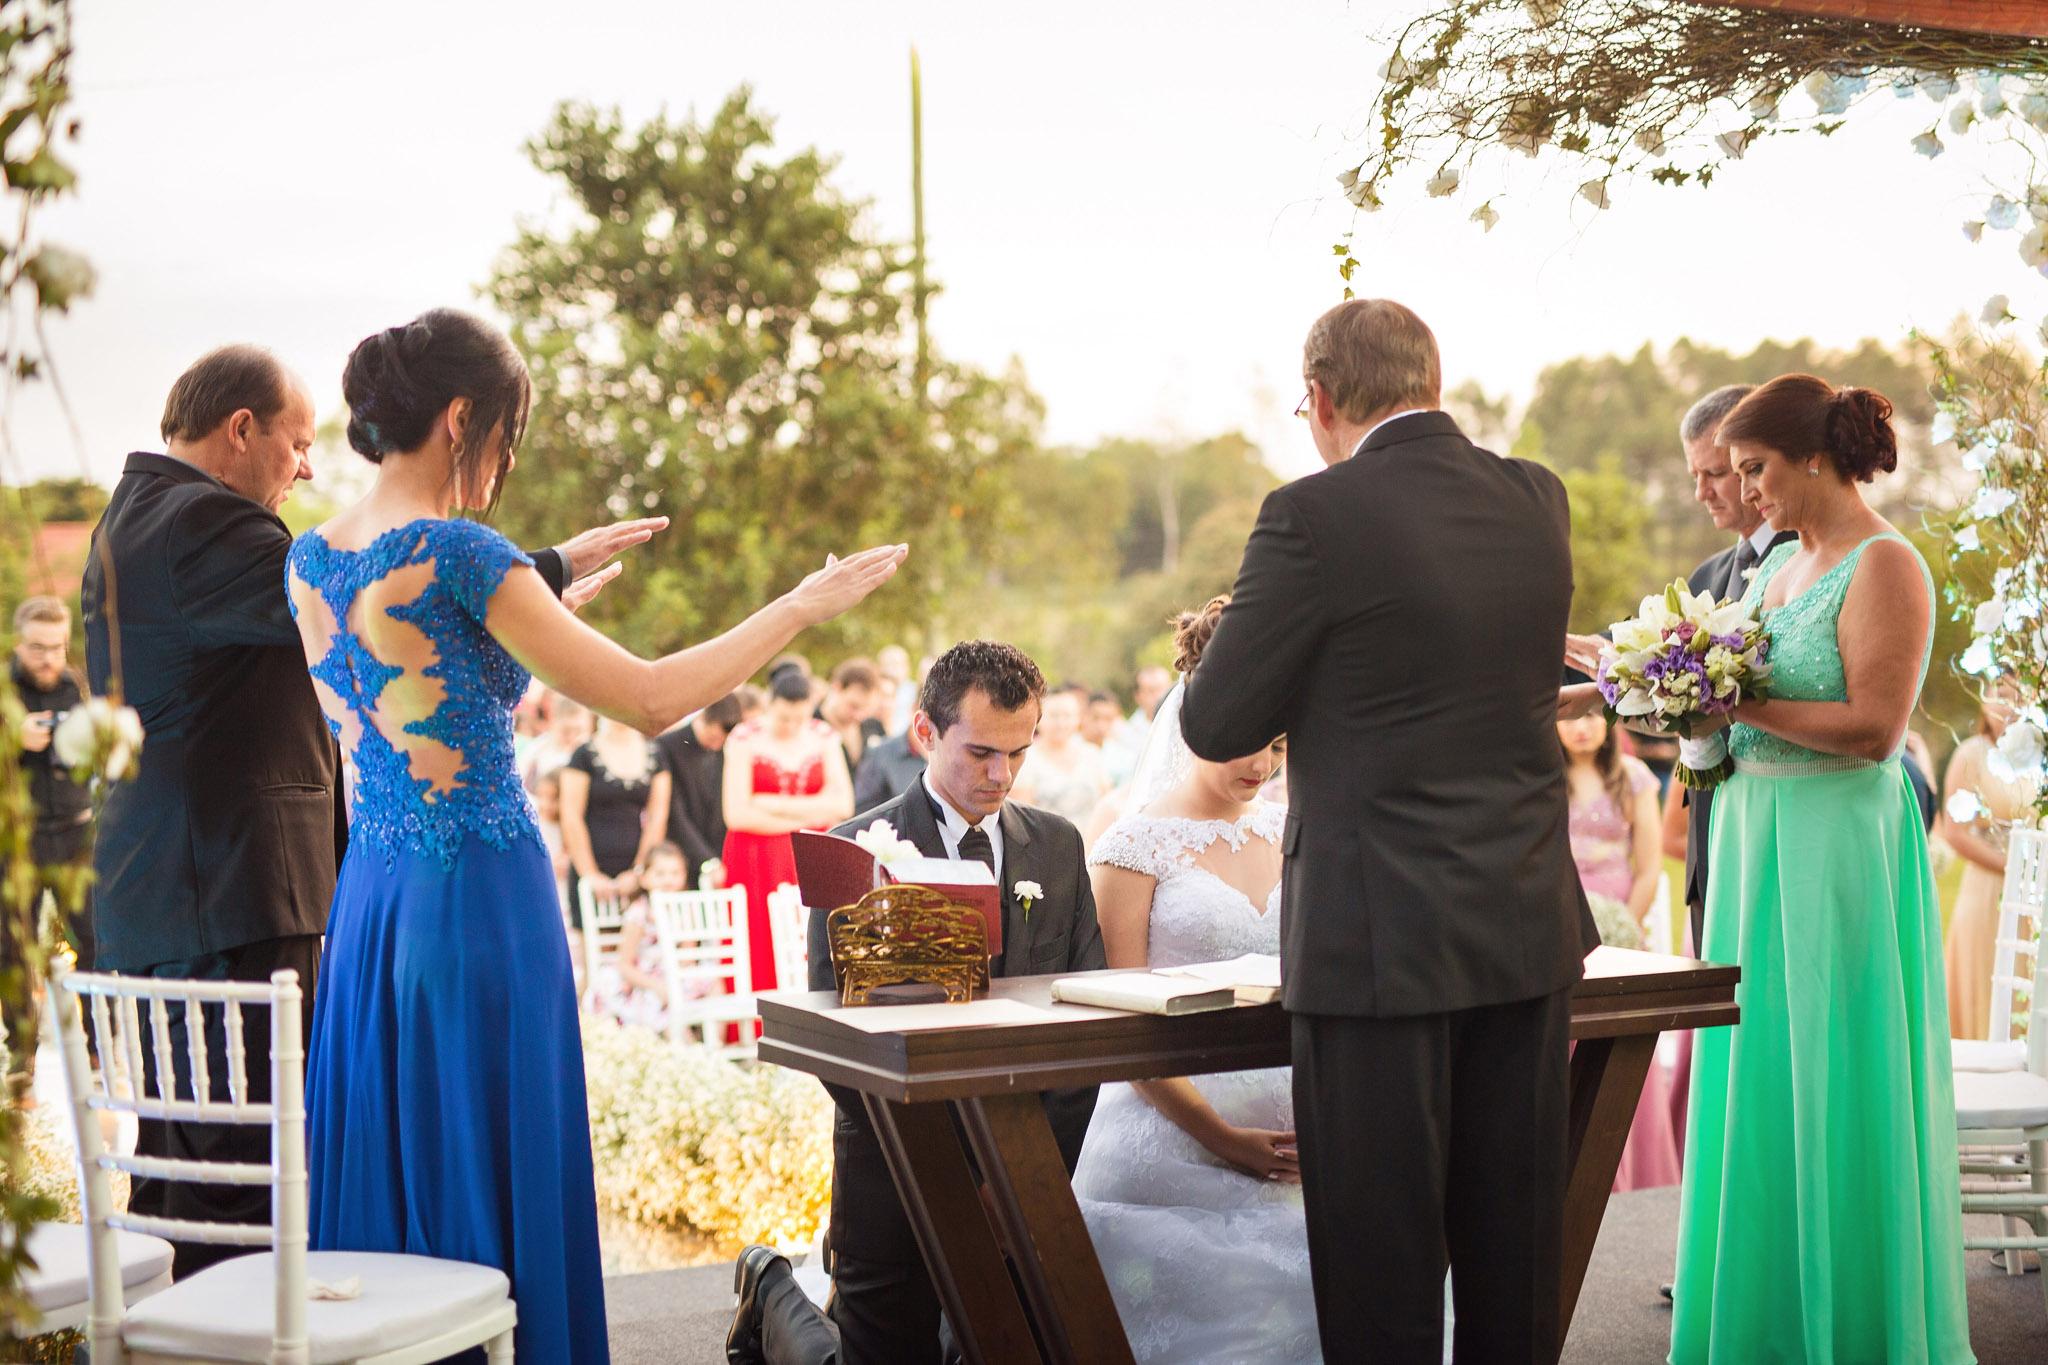 wedding-travellers-destination-wedding-photography-brazil-iguazu-8